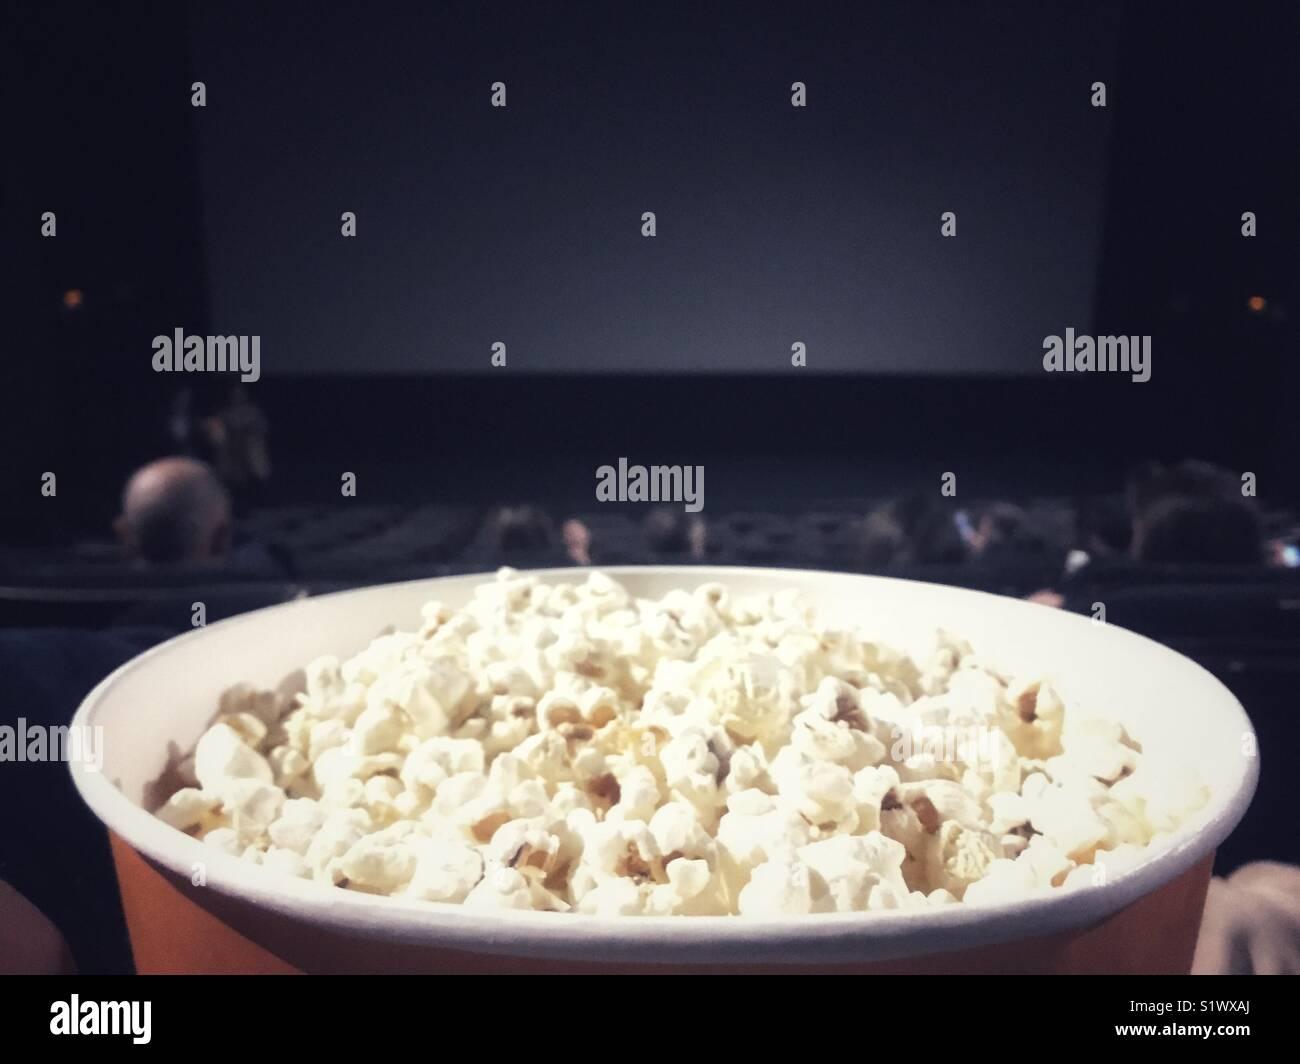 Bol de Popcorn at the Movie Theater Photo Stock